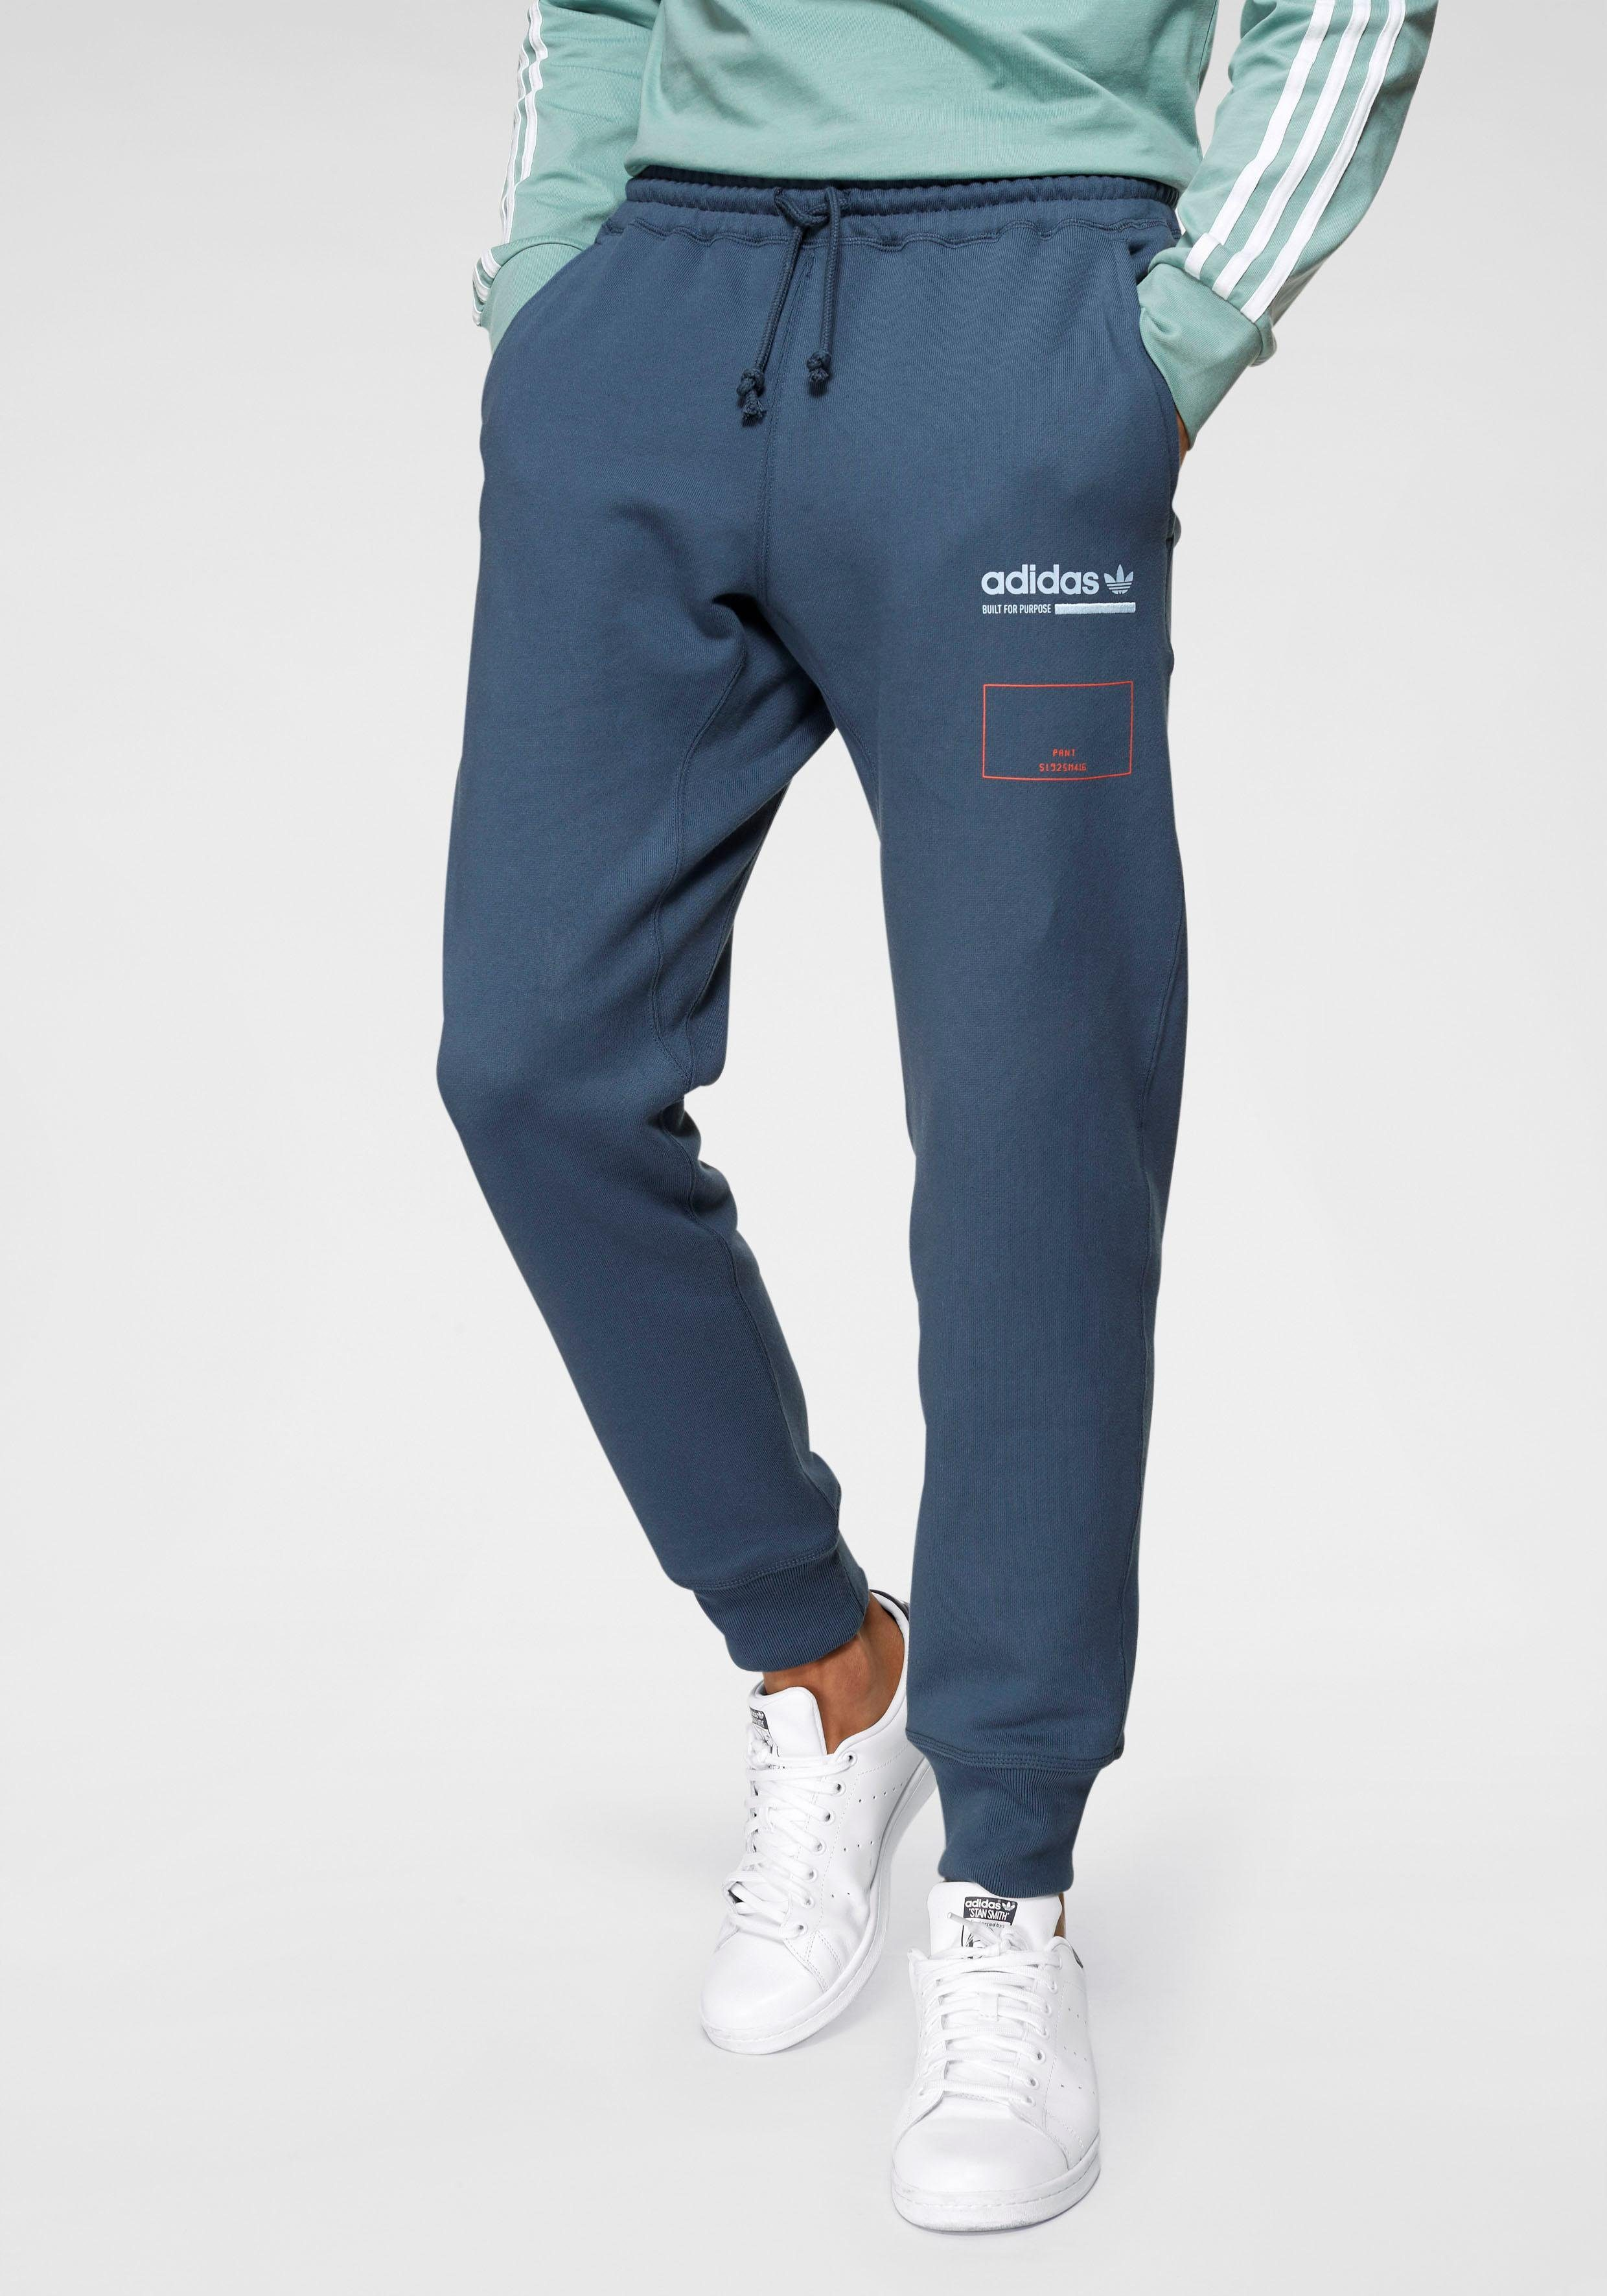 adidas Originals Jogginghose »SWEATPANT« kaufen | OTTO